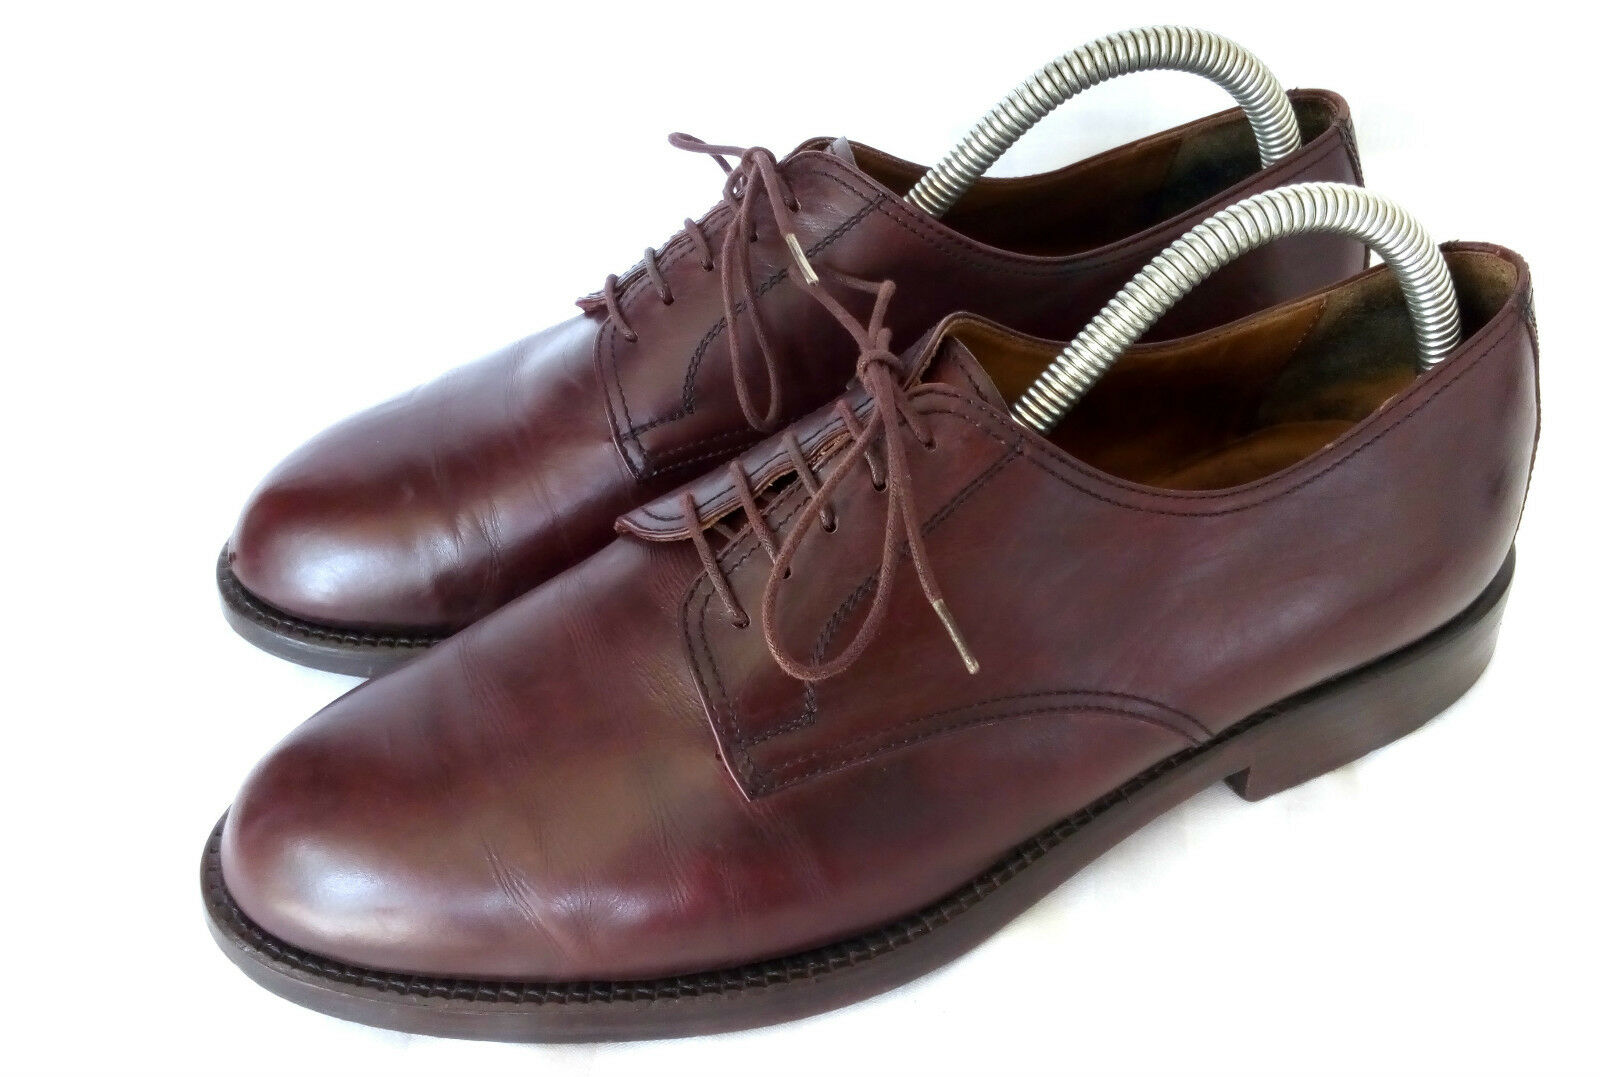 Ralph Harrison Plain Derby Business Herrenschuhe Burgundy Oxblood Leder Gr. 43,5    | Primäre Qualität